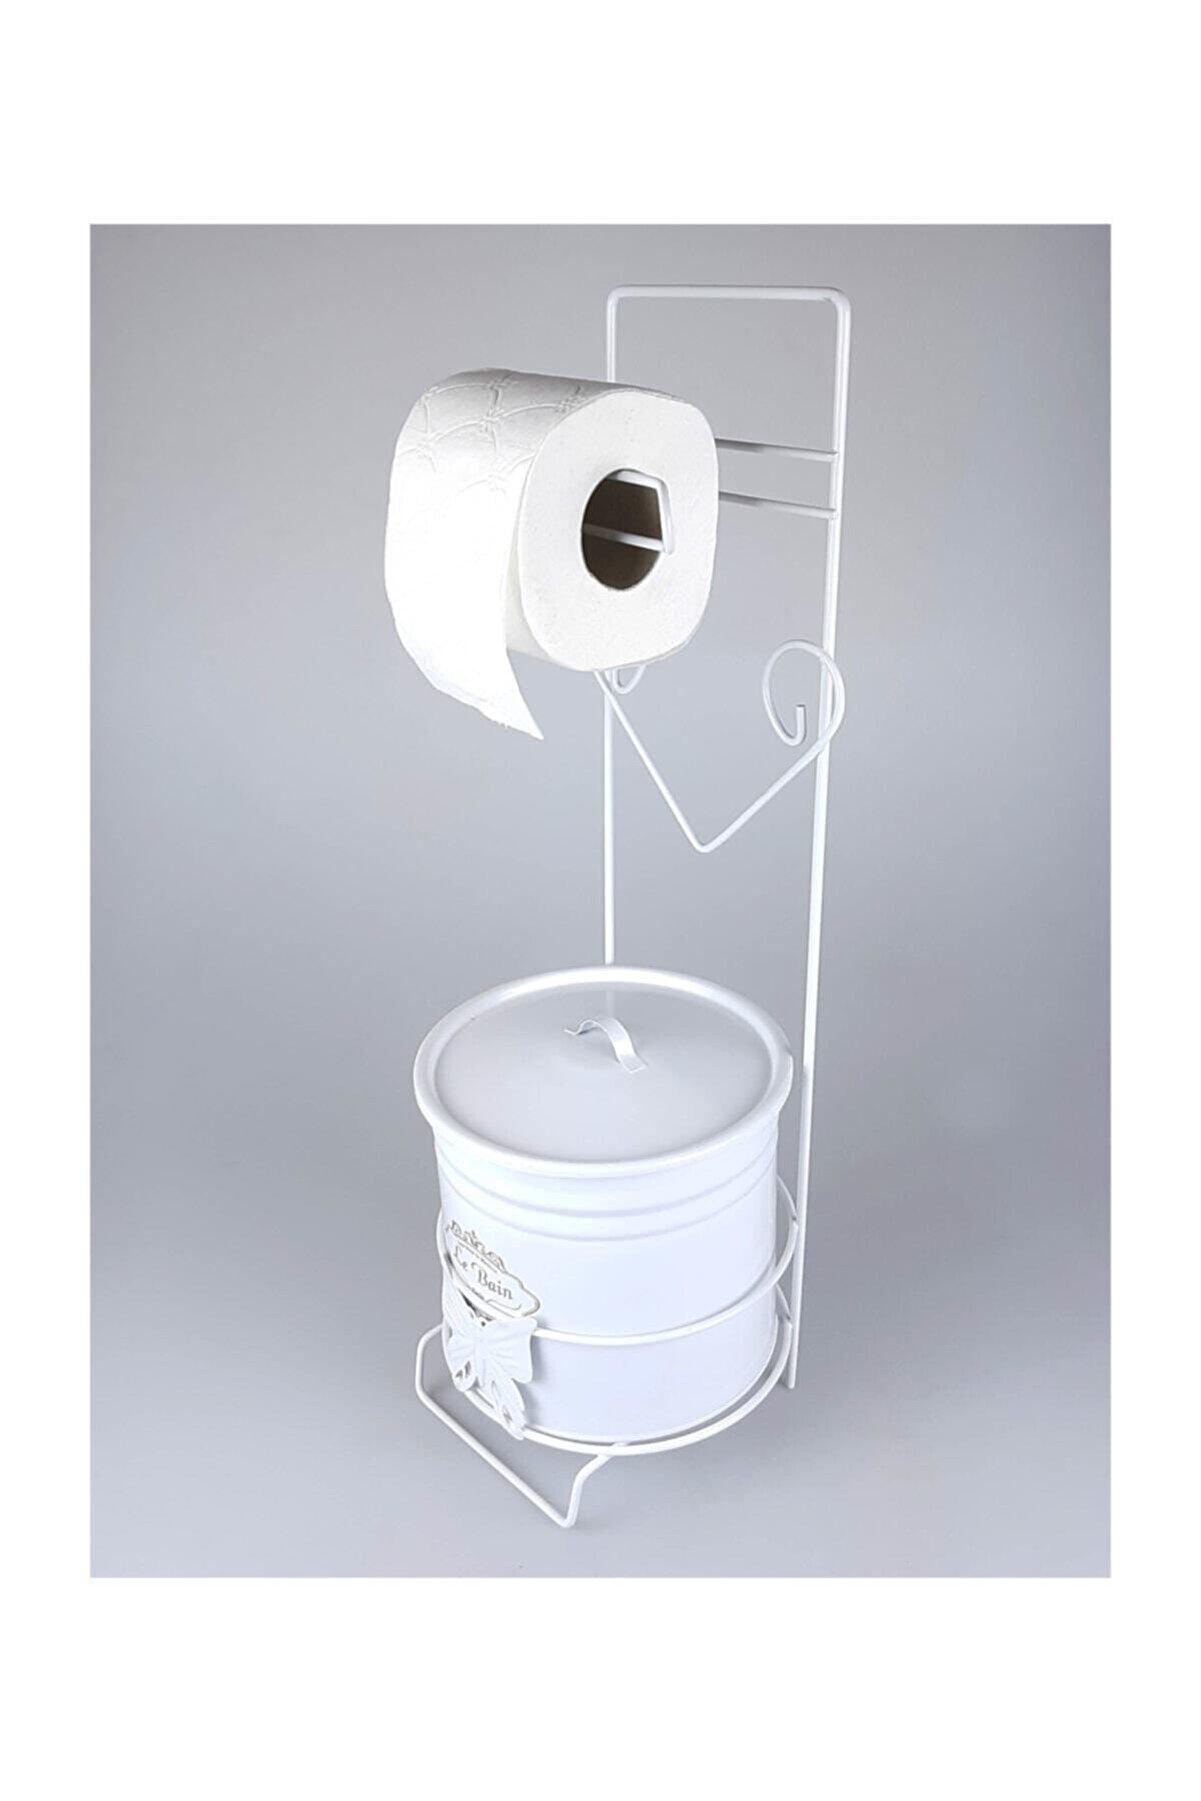 Betsy Wc Kağıtlık Çöp Kovalı Ferforje , Tuvalet Kağıtlığı , Banyo Çöp Kovası